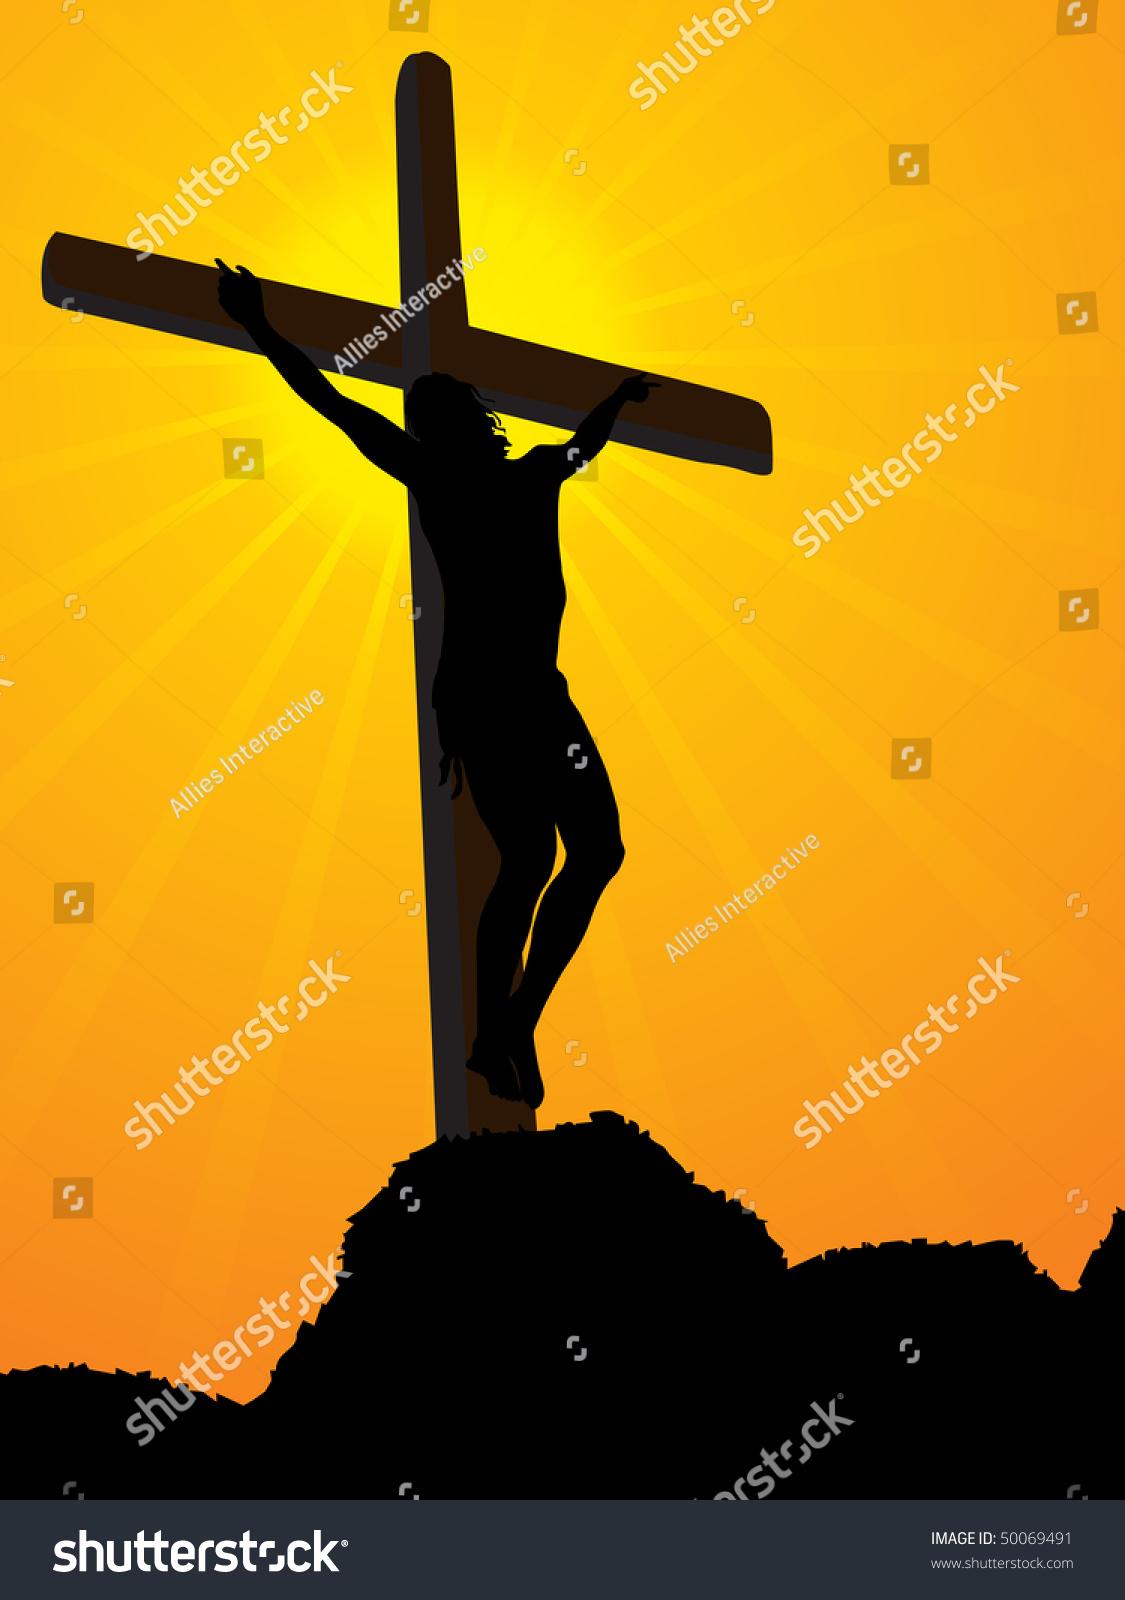 abstract yellow rays background jesus cross stock vector 50069491